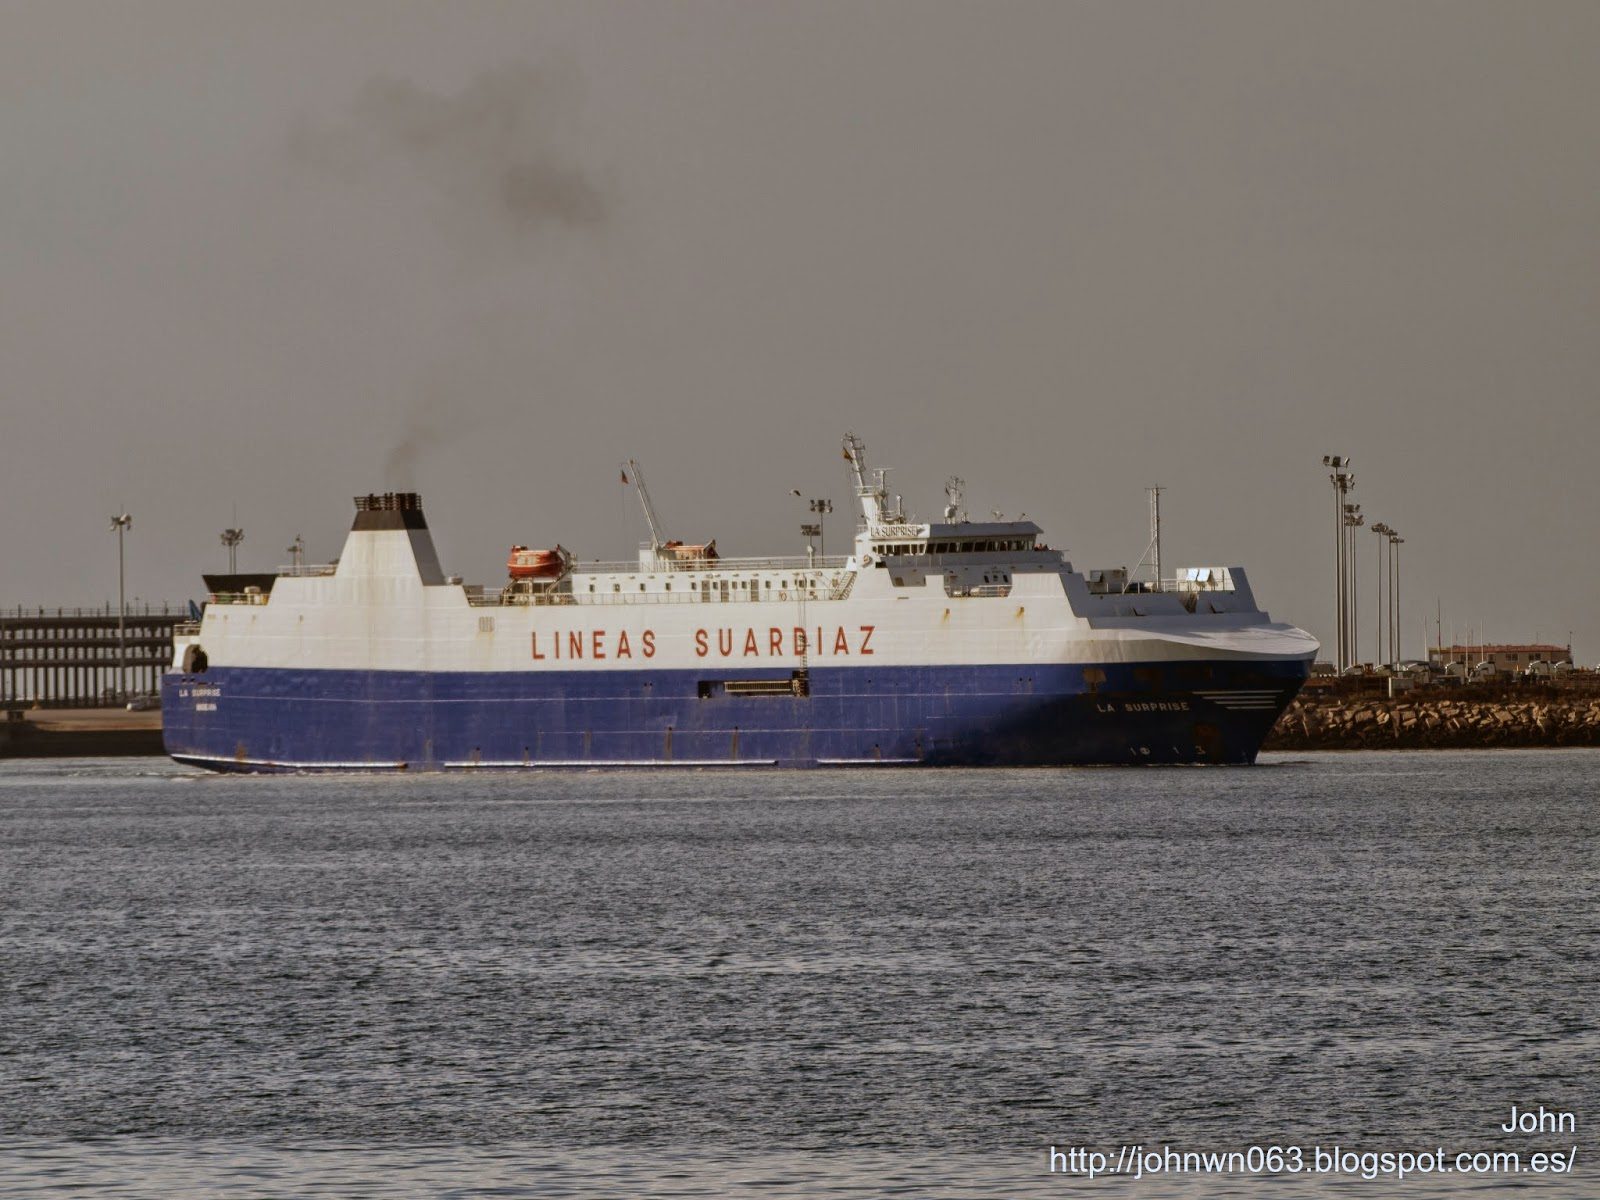 fotos de barcos, imagenes de barcos, la surprise, grupo suardiaz, car carrier, ro/ro, vigo